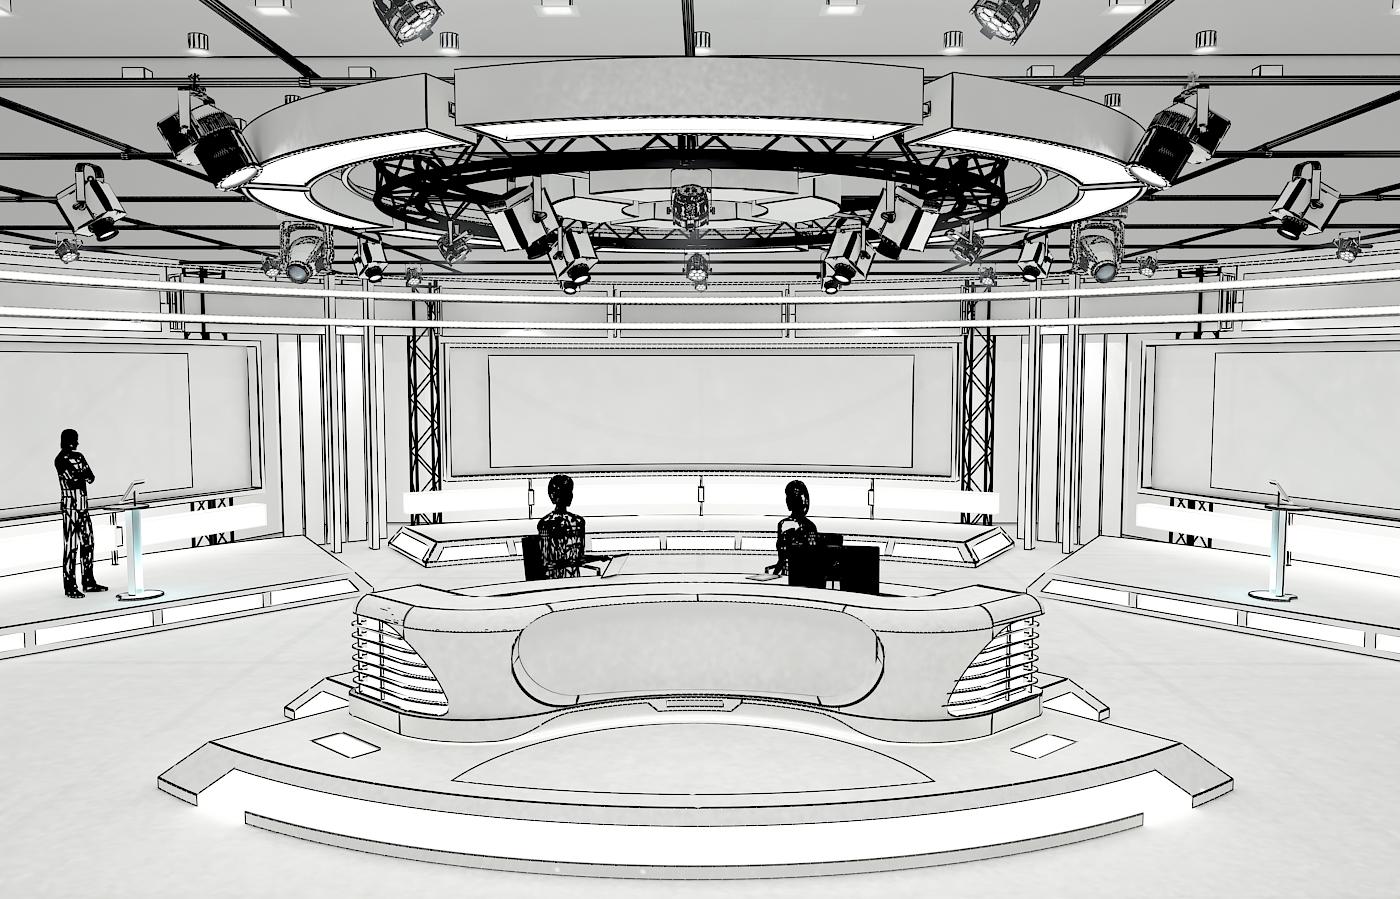 виртуал телевизийн студи цуглуулга vol 6 3d загвар max dxf dwg fbx obj 223363